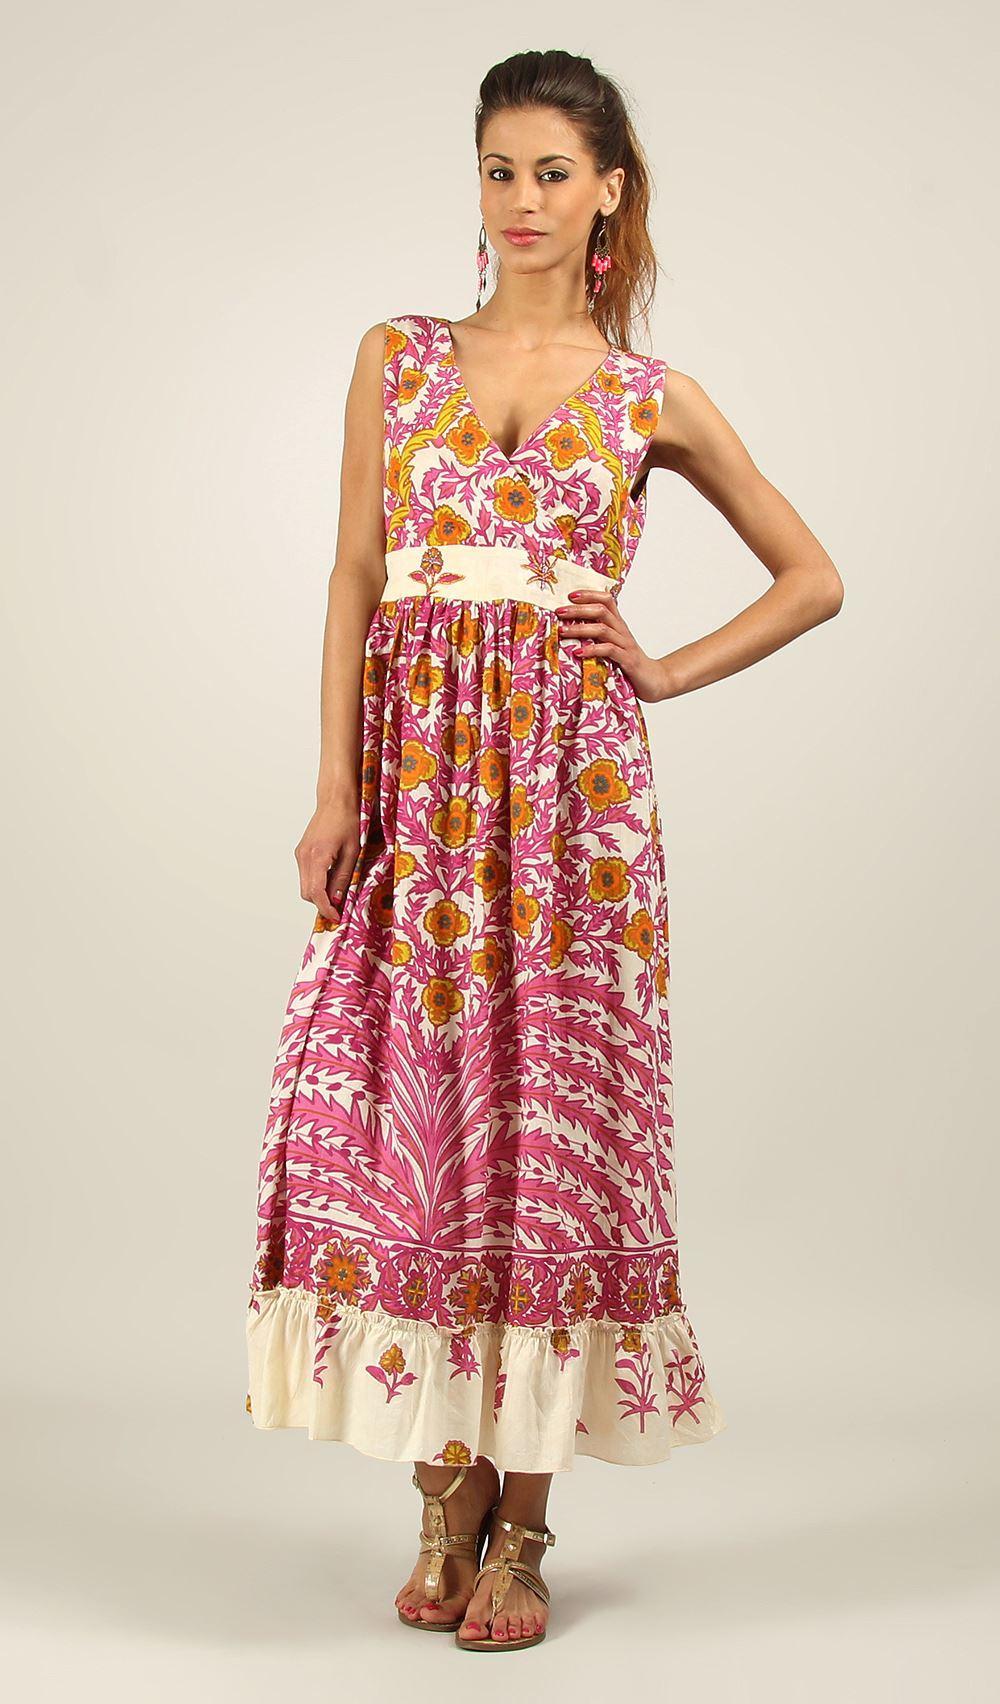 New-Ladies-Floral-Kushi-Summer-Vibrant-Holiday-Cotton-Maxi-Dress-Size-10-22